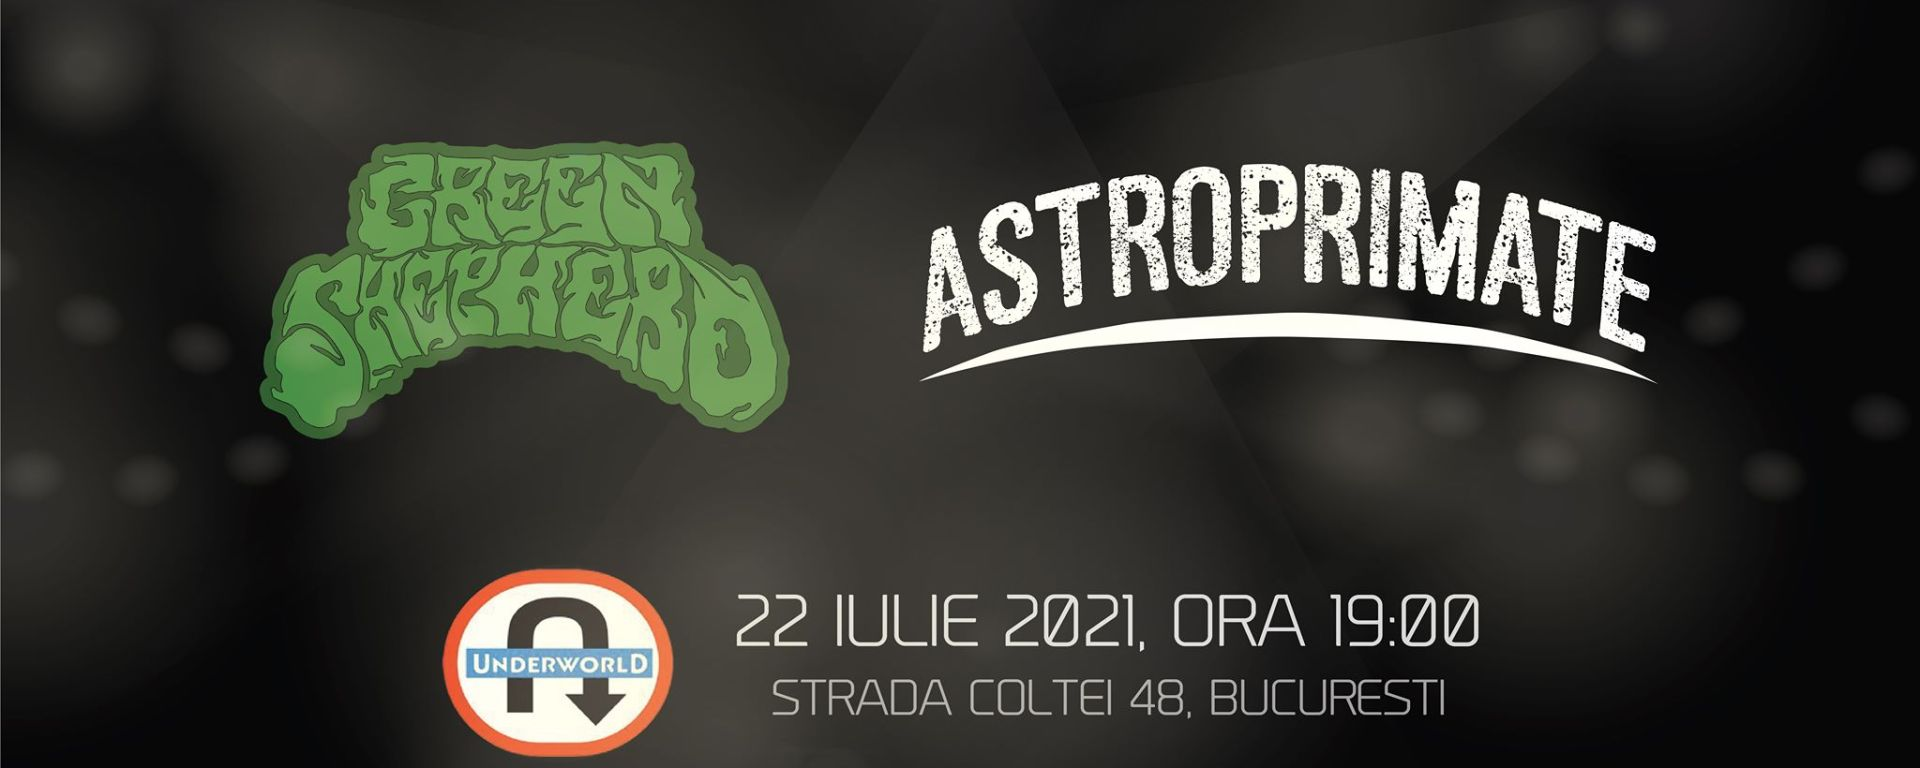 Green Shepherd & Astroprimate @ Underworld Club